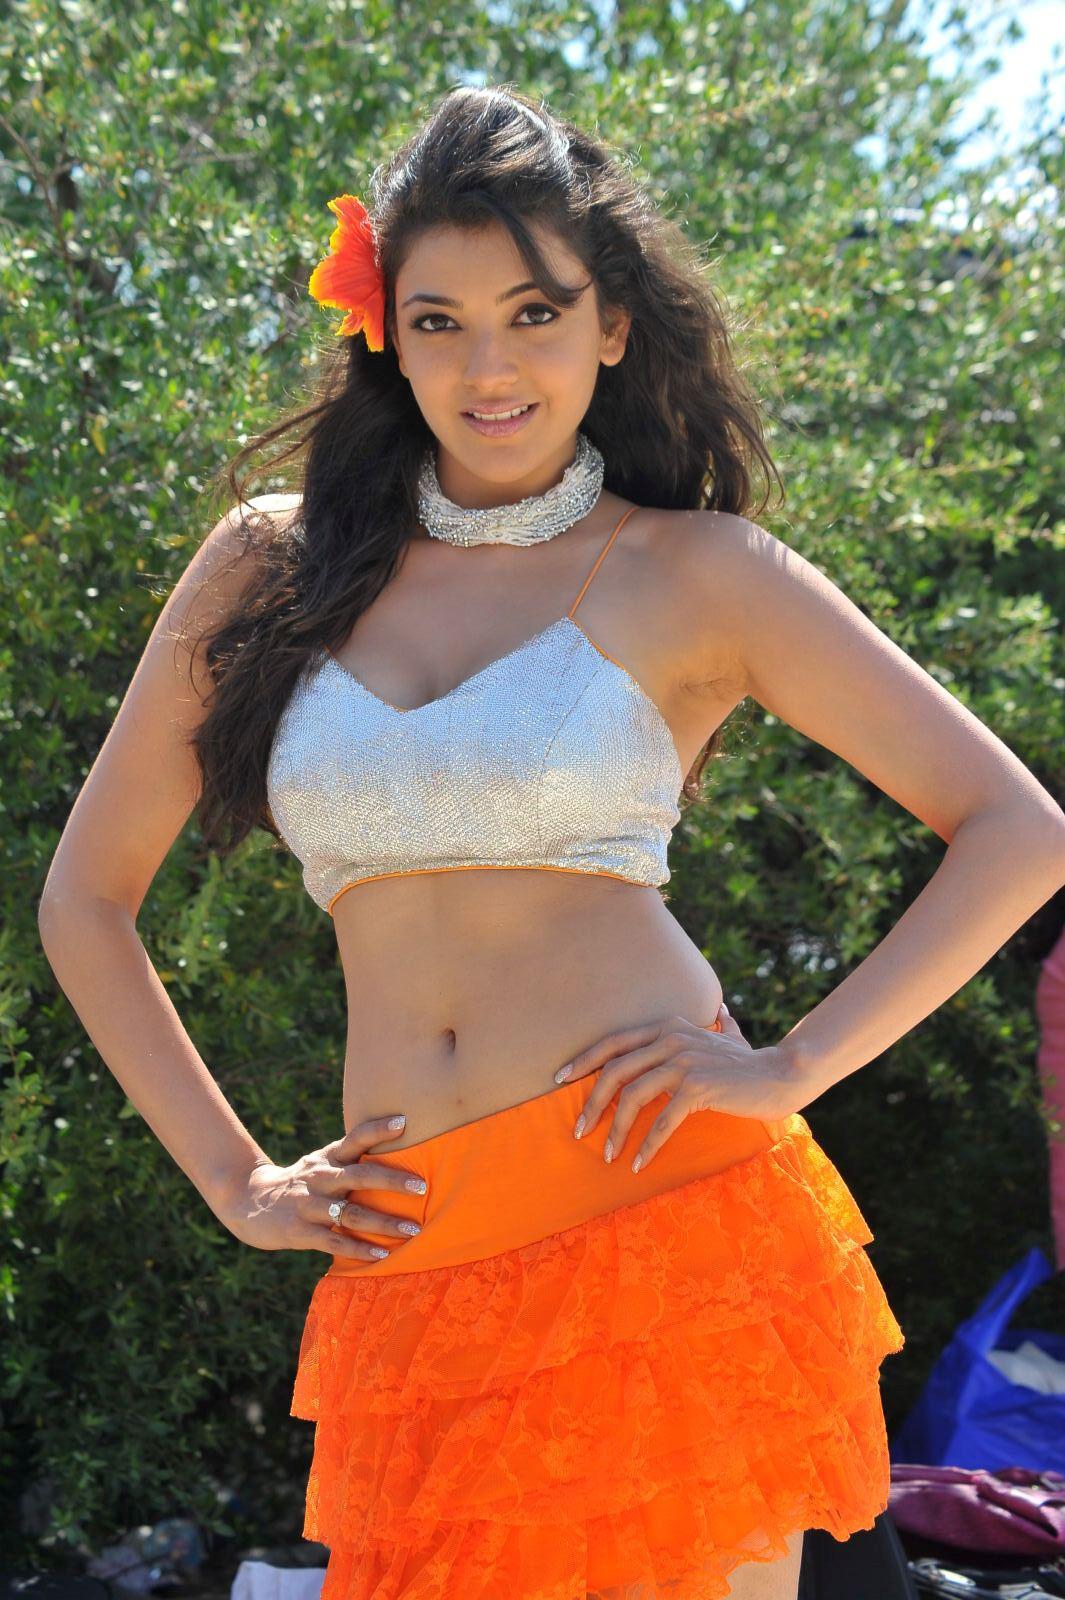 Sameera reddy saree fuck clothed - 1 part 6